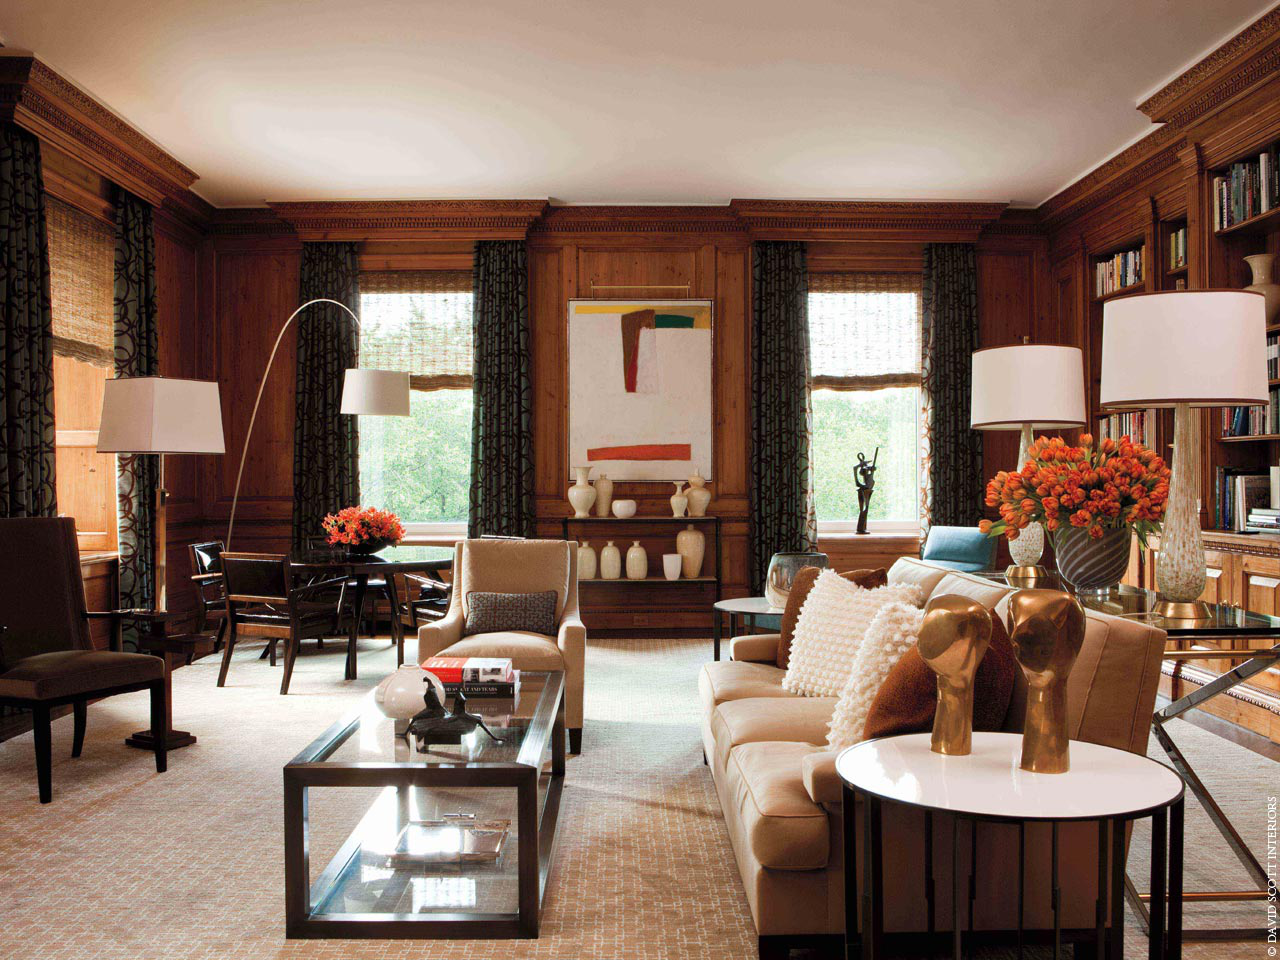 Fifth Avenue residence living room by David Scott Interiors, LTD.